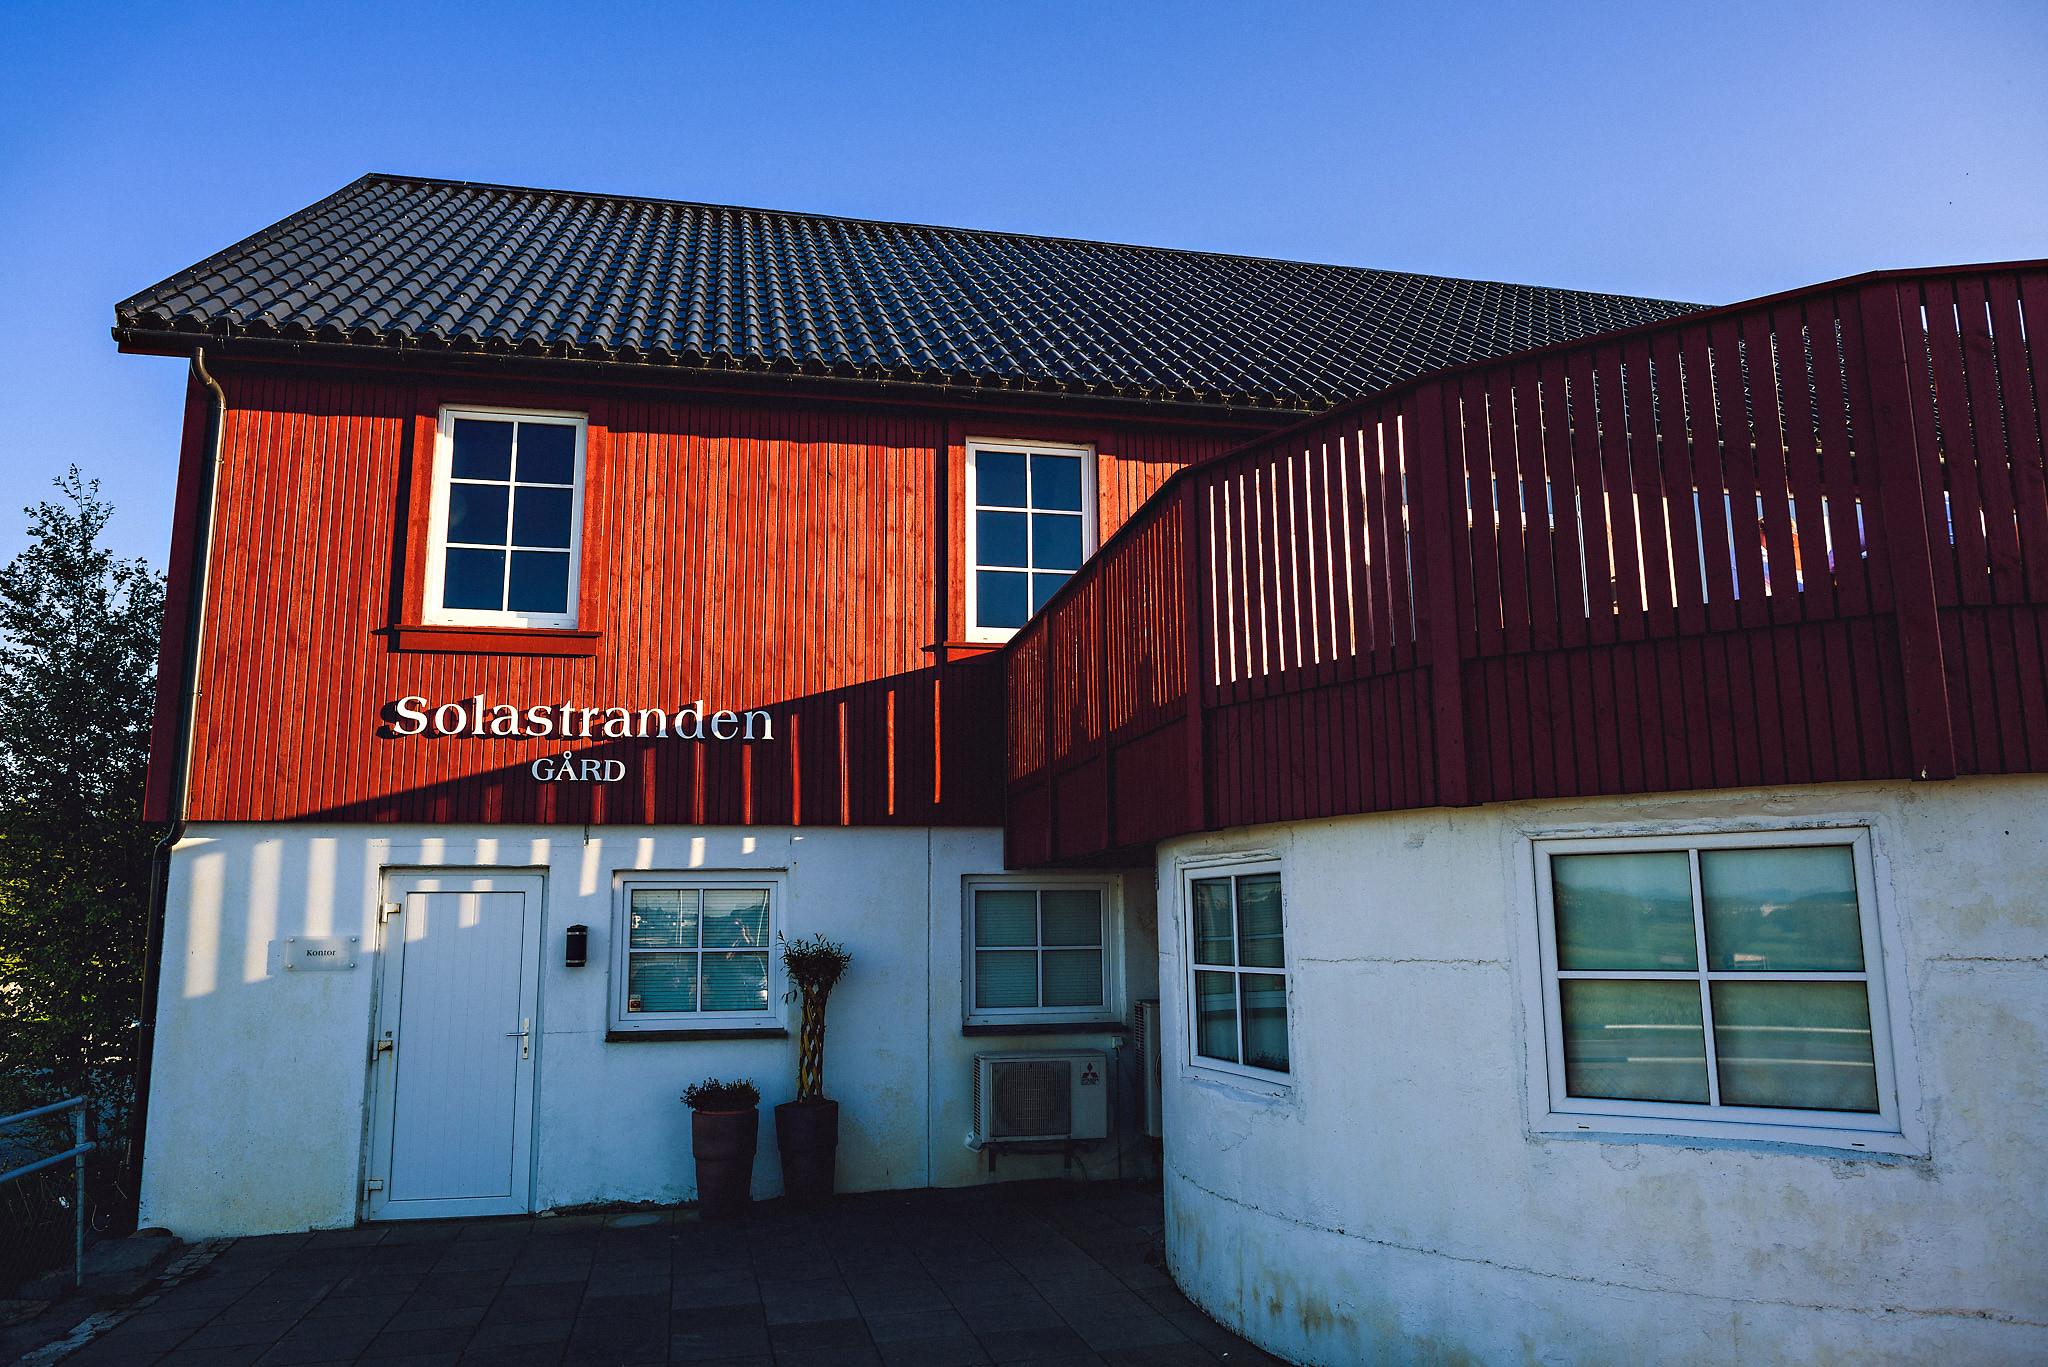 Bryllup på Solastranden Gård fotograf Eirik Halvorsen-17.jpg